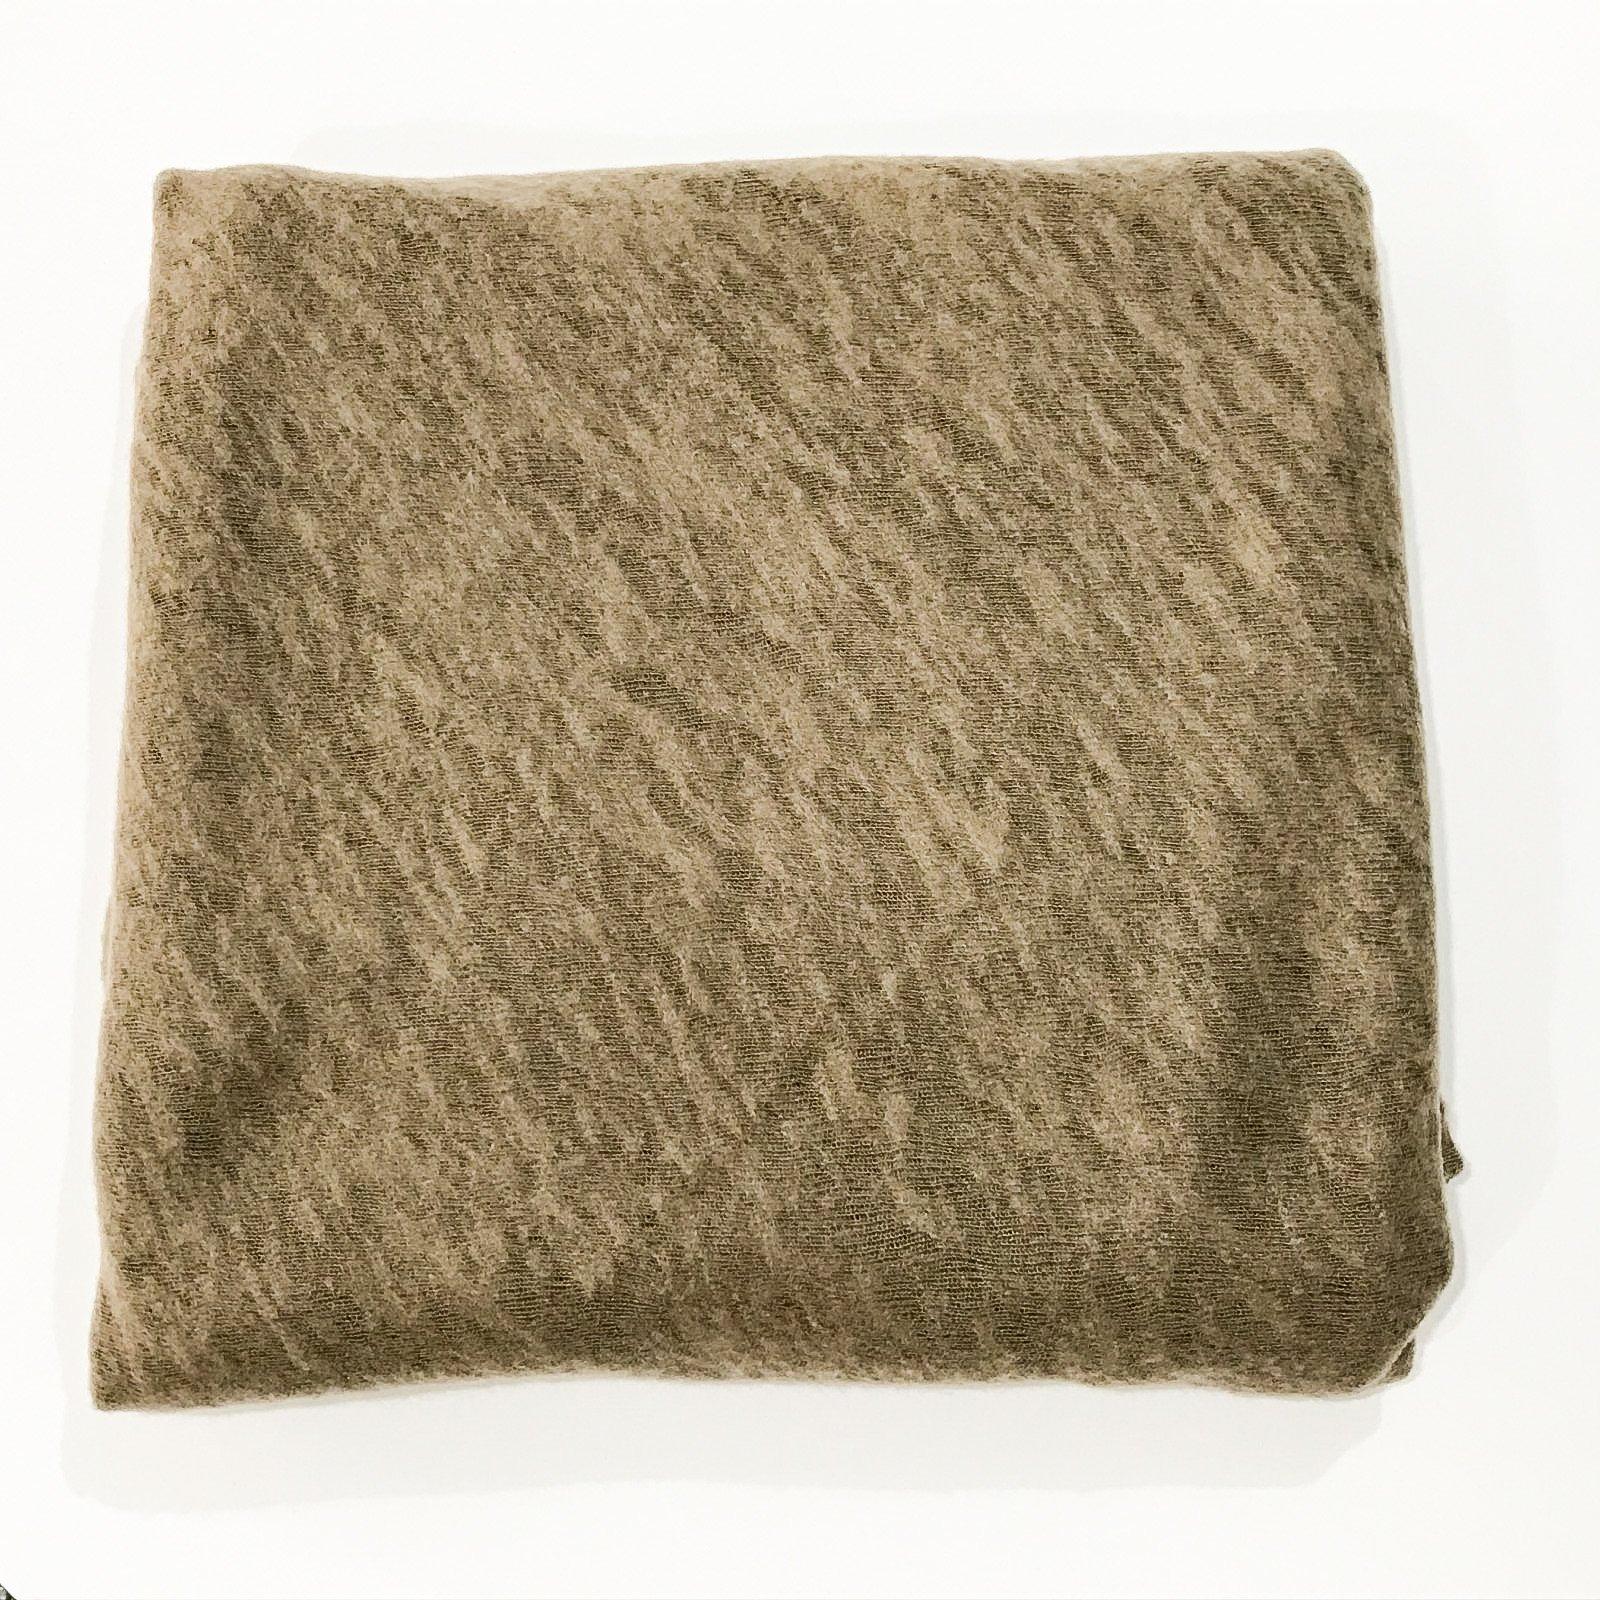 Slub Sweater Knit - Milk Chocolate- 2 yards